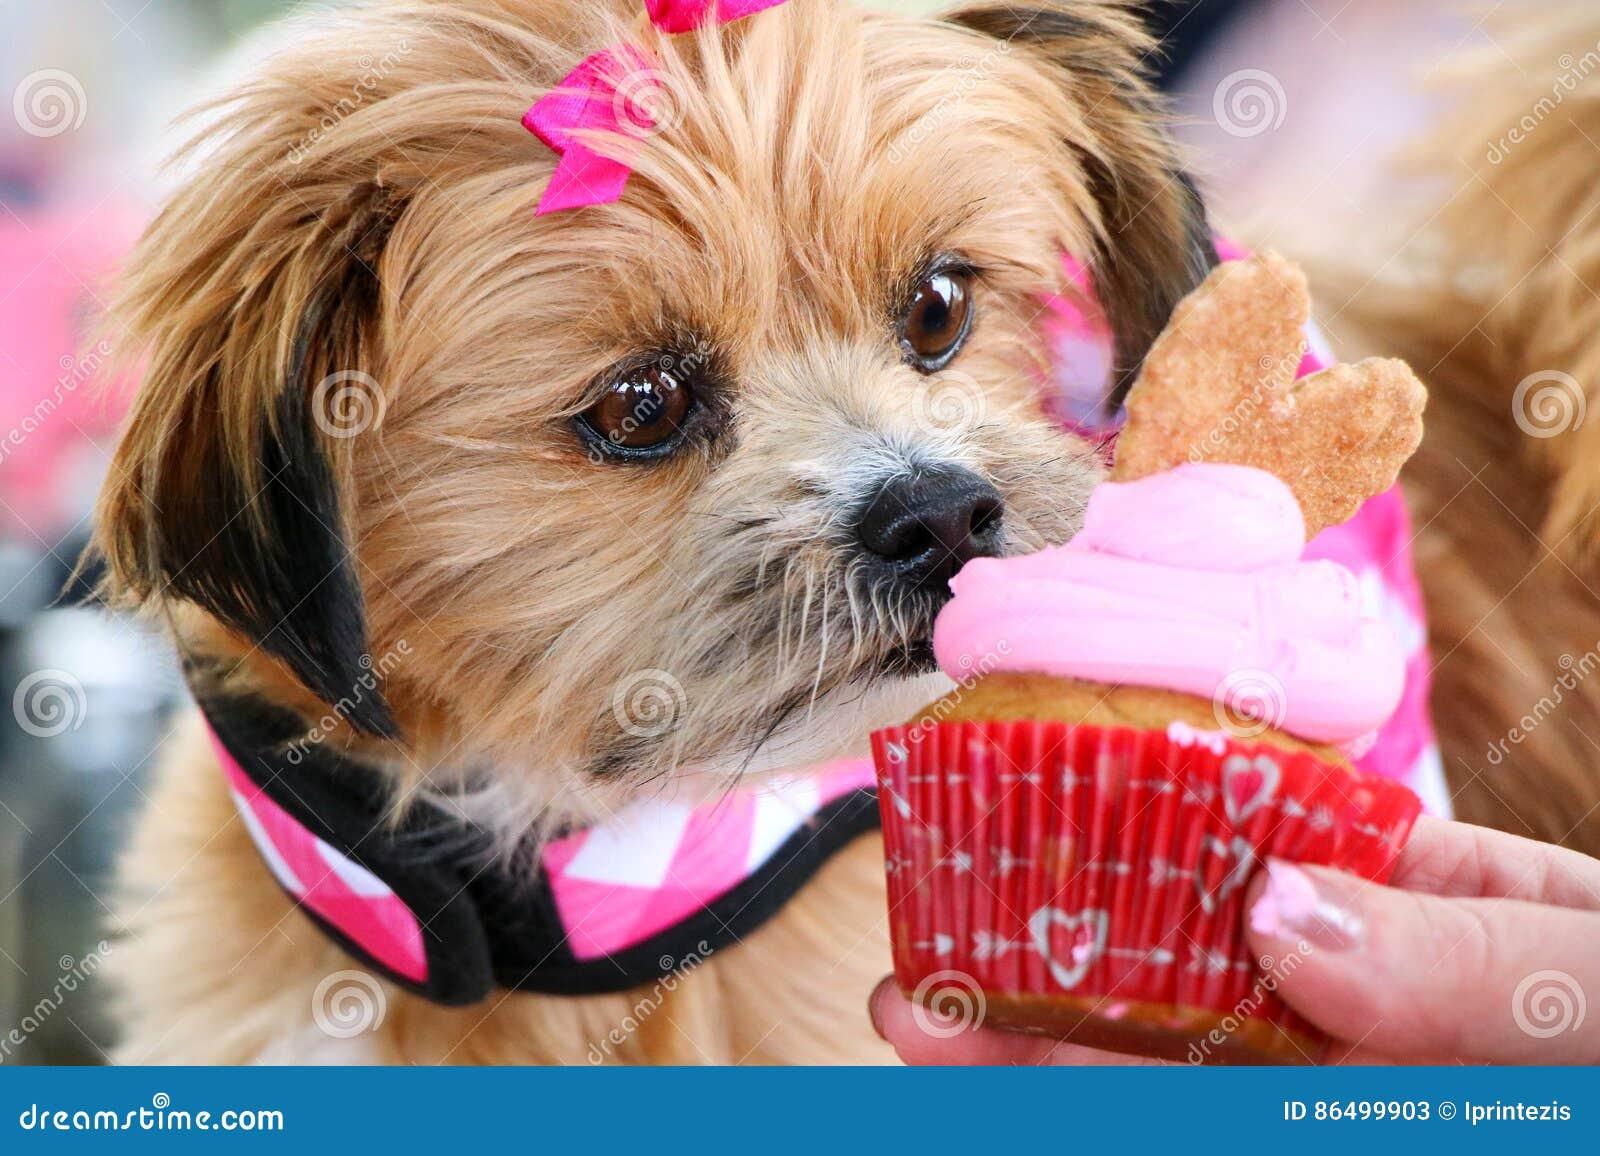 Cute Dog Eating Birthday Cupcake Stock Image - Image of